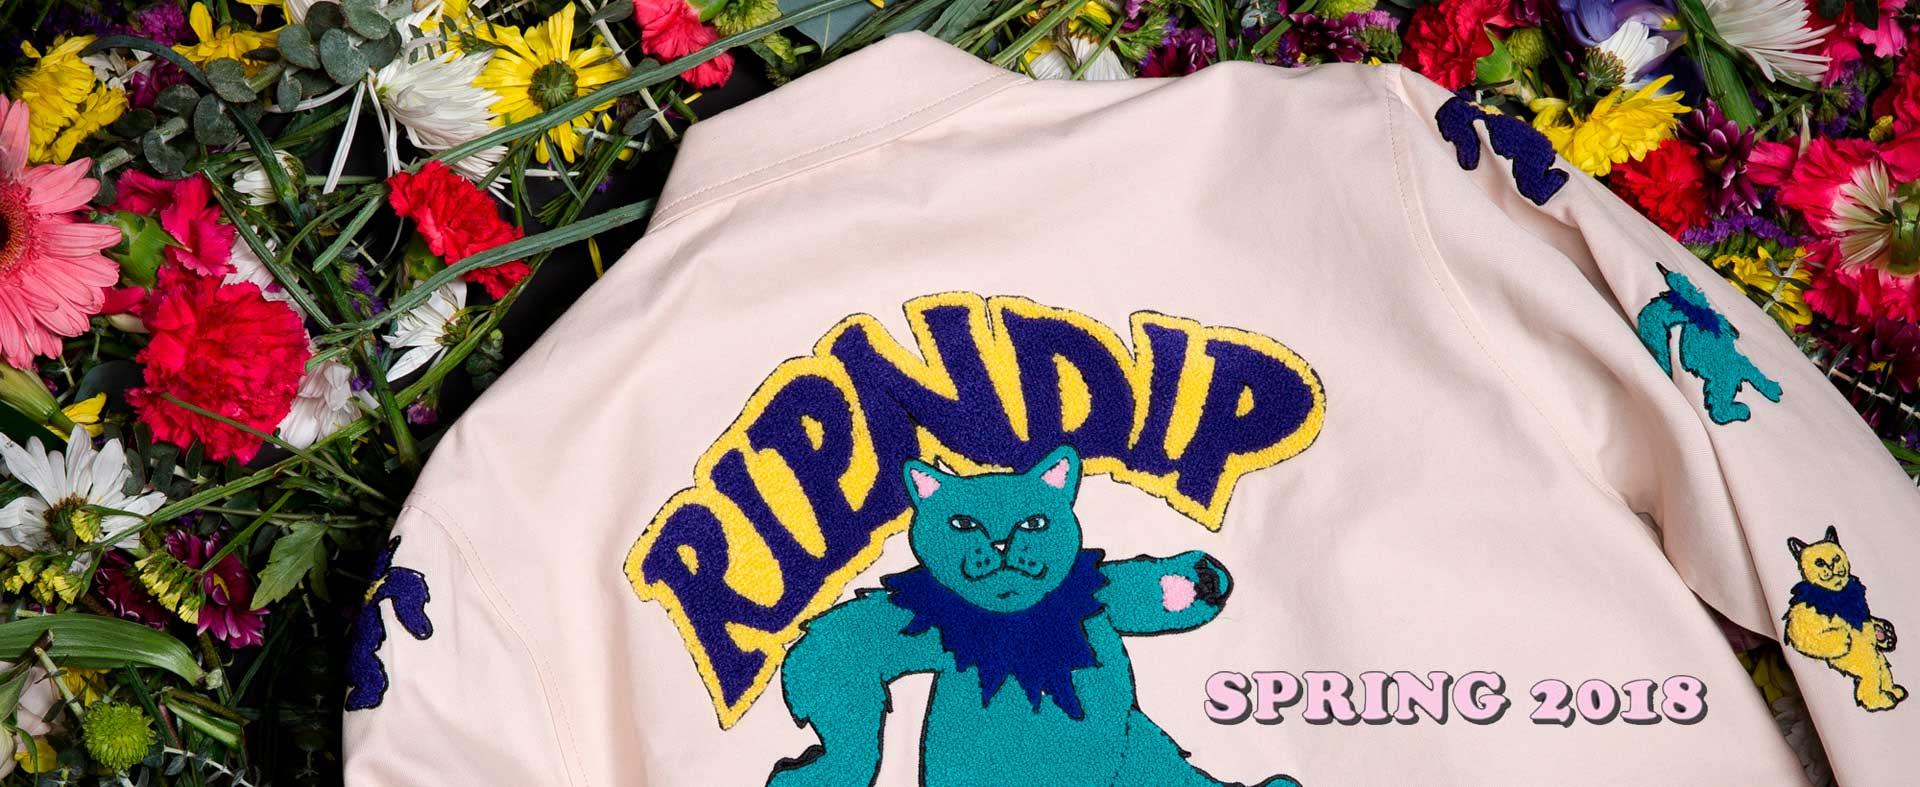 Ripndip коллекция Spring 2018